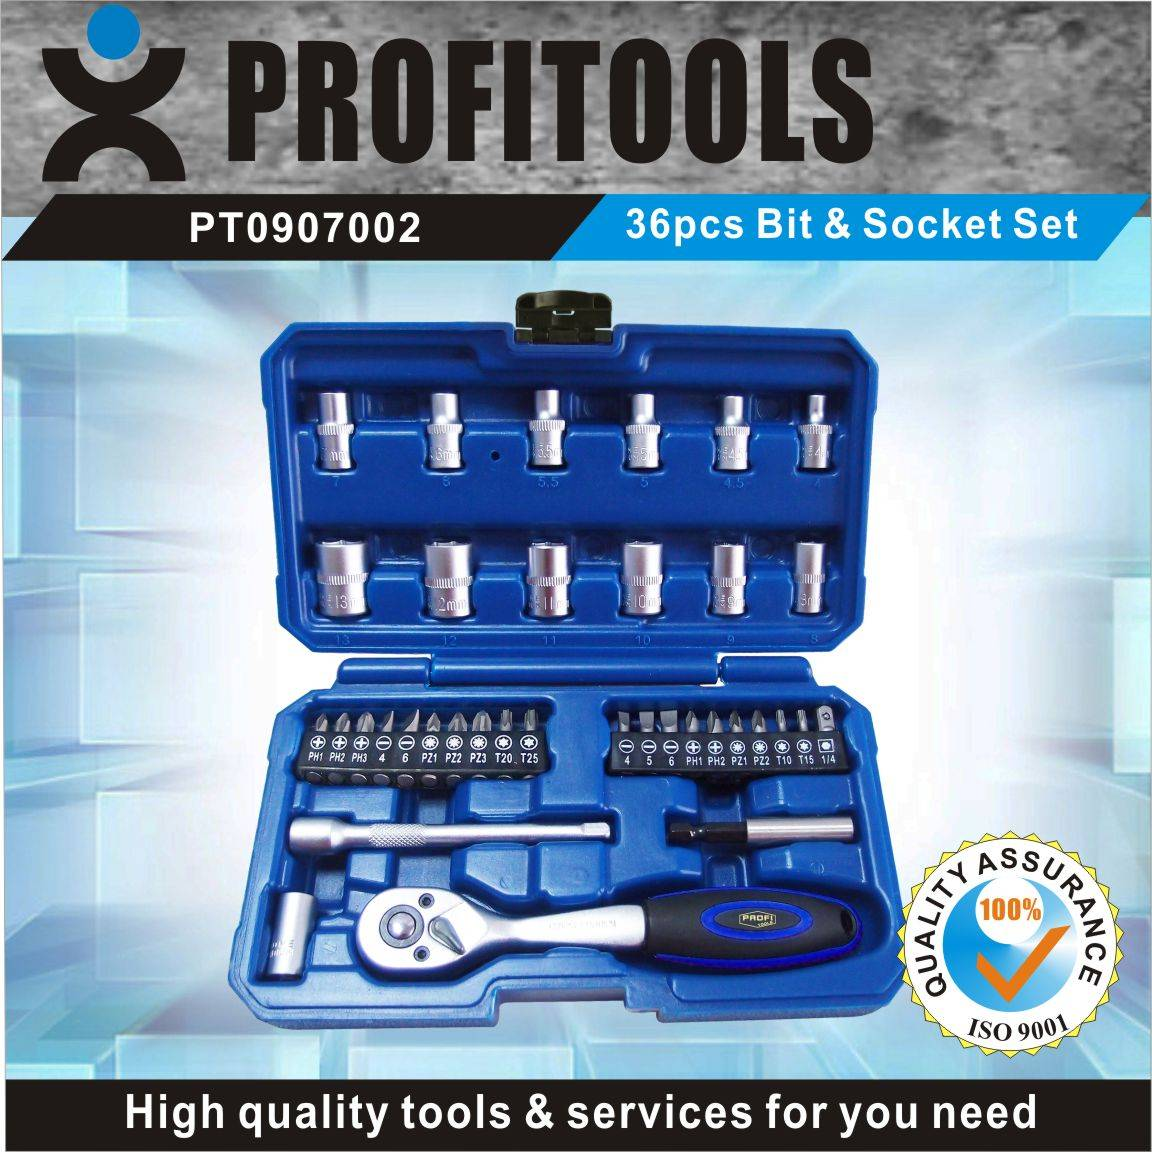 36pcs Hot Selling Bit and Socket set for Household